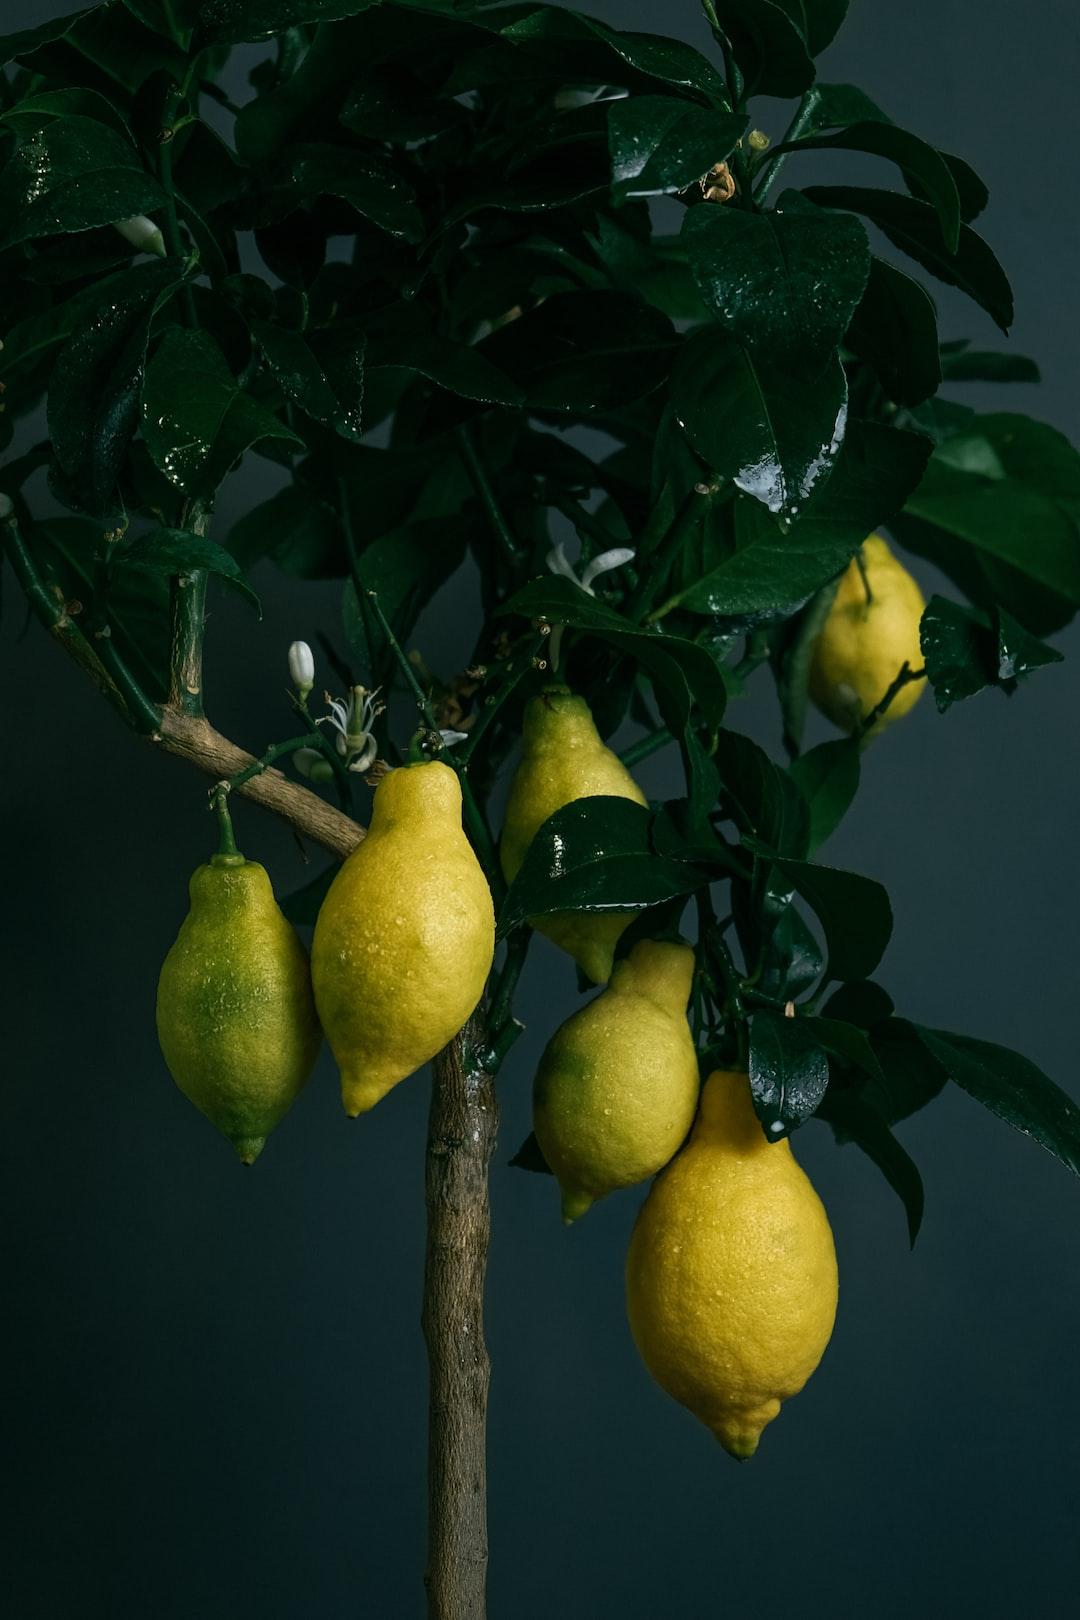 Lemon 🌱 🍋